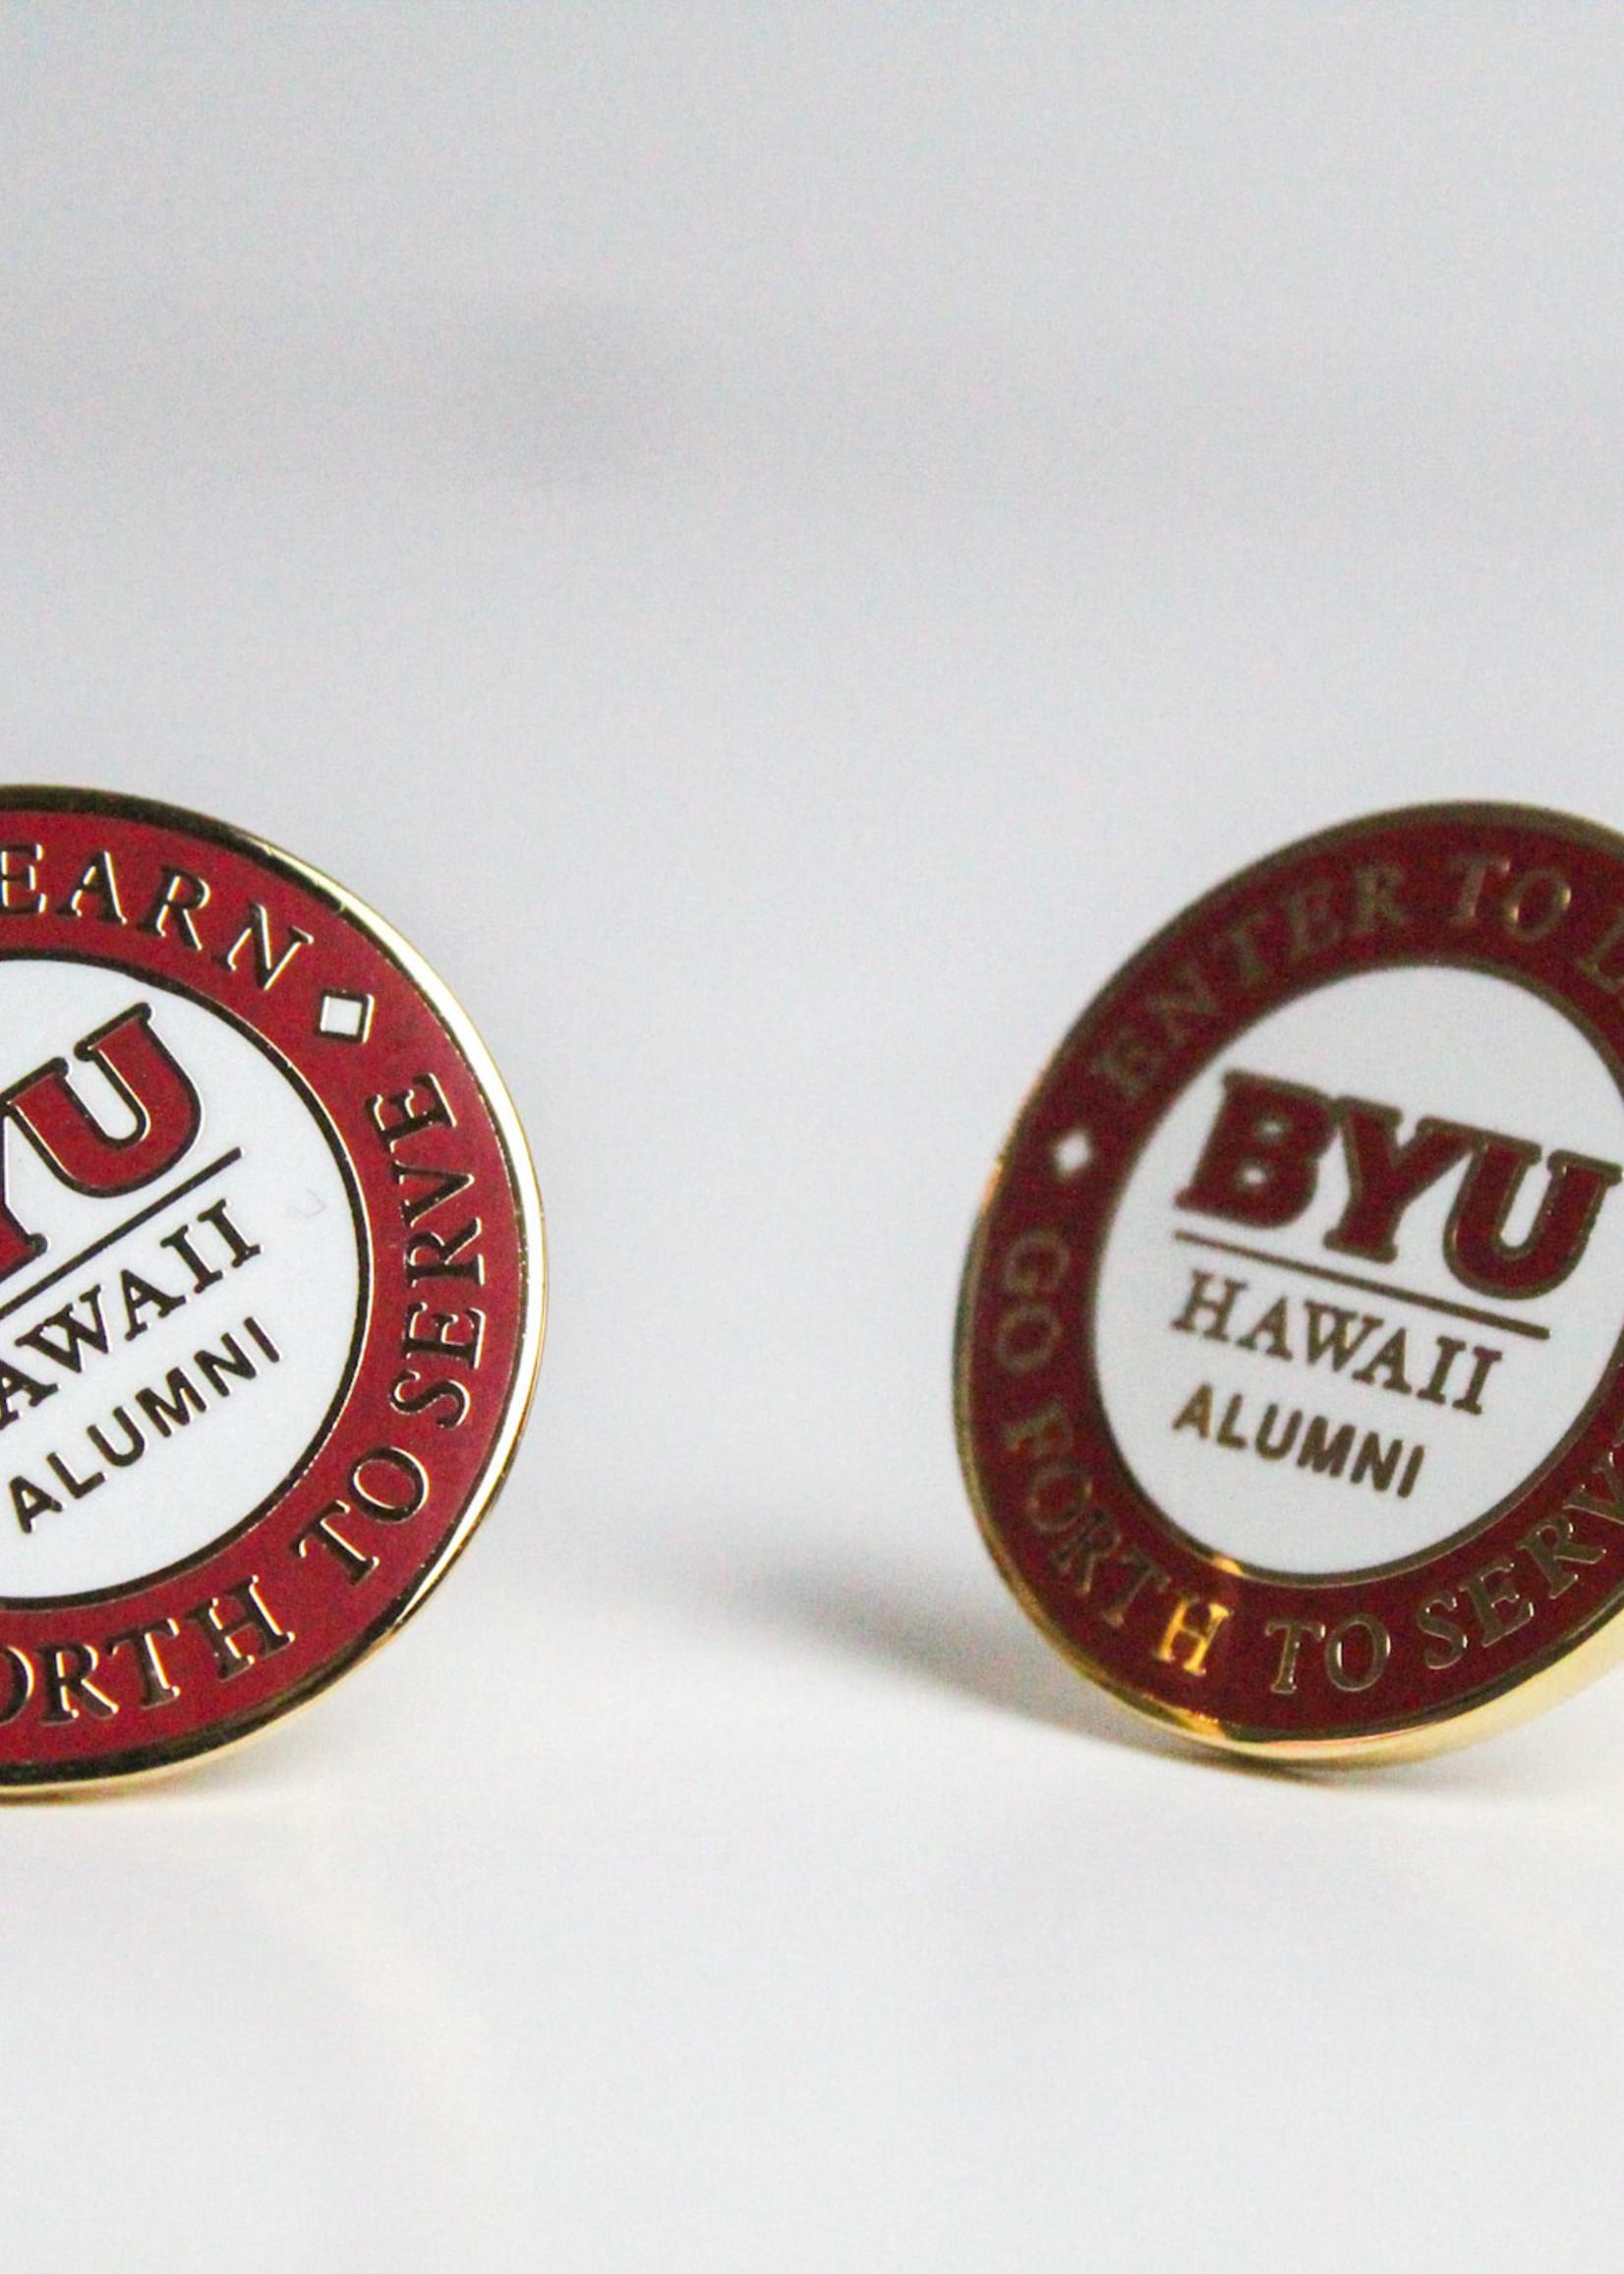 Clearance - BYUH Alumni Cufflinks